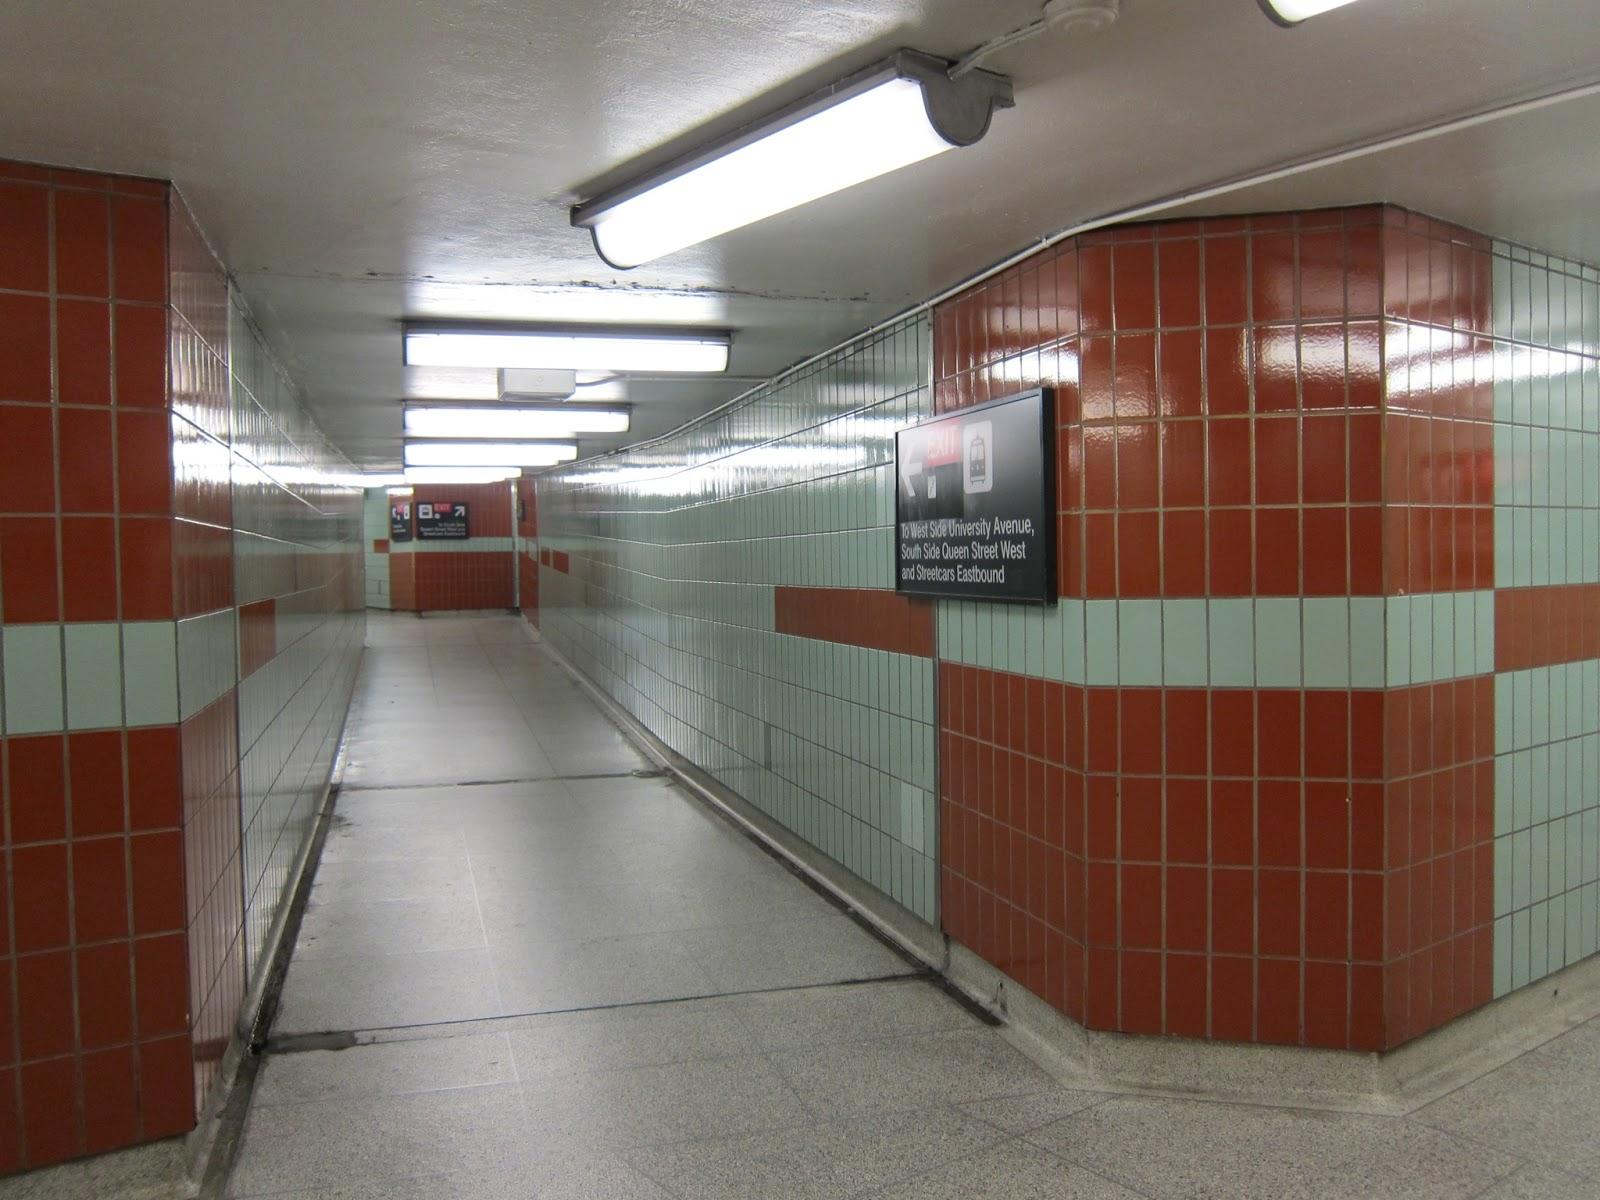 Osgoode station mezzanine corridor